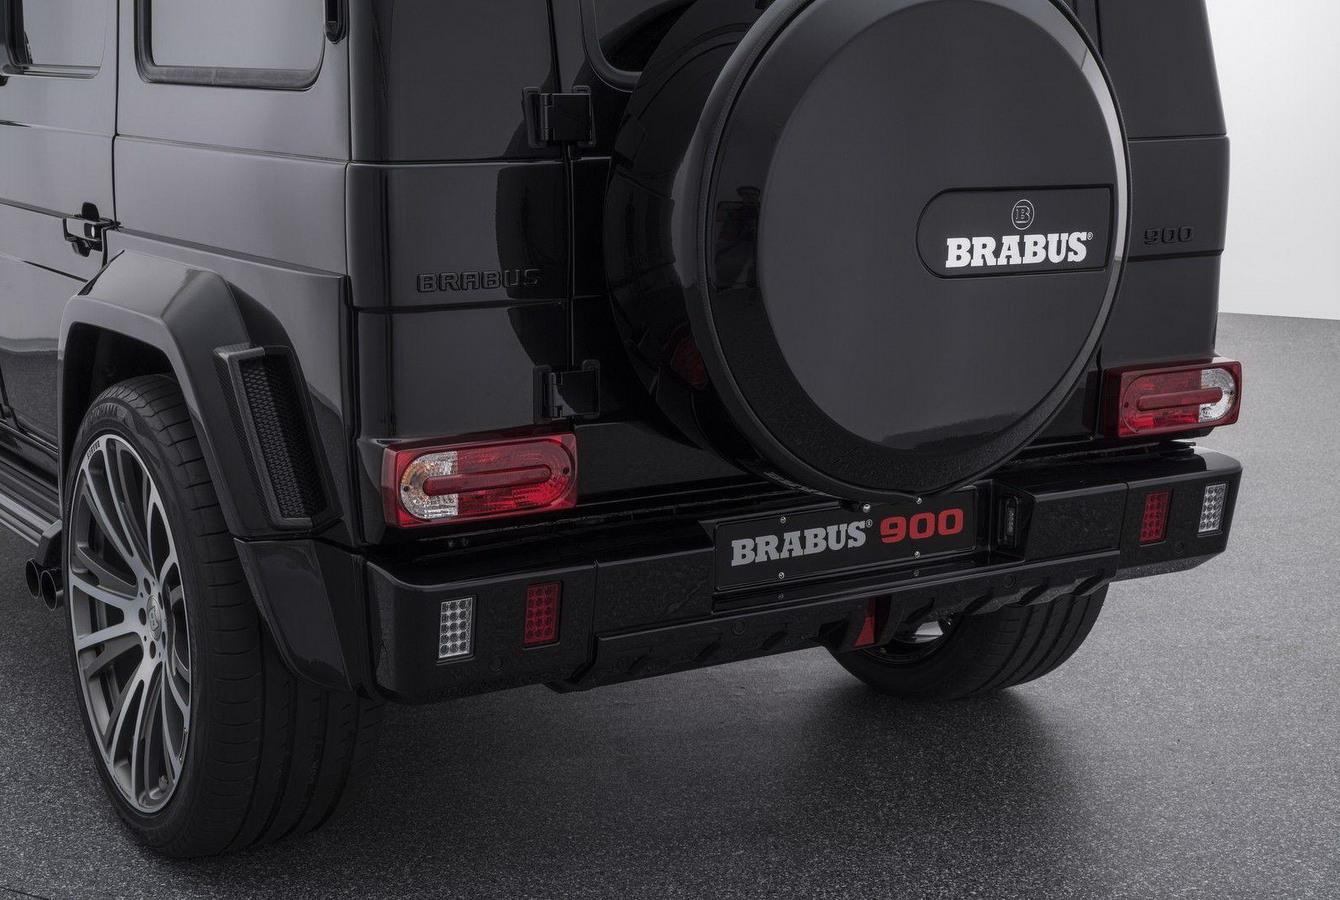 brabus-900-one-of-ten-mercedes-amg-g65-16.jpg